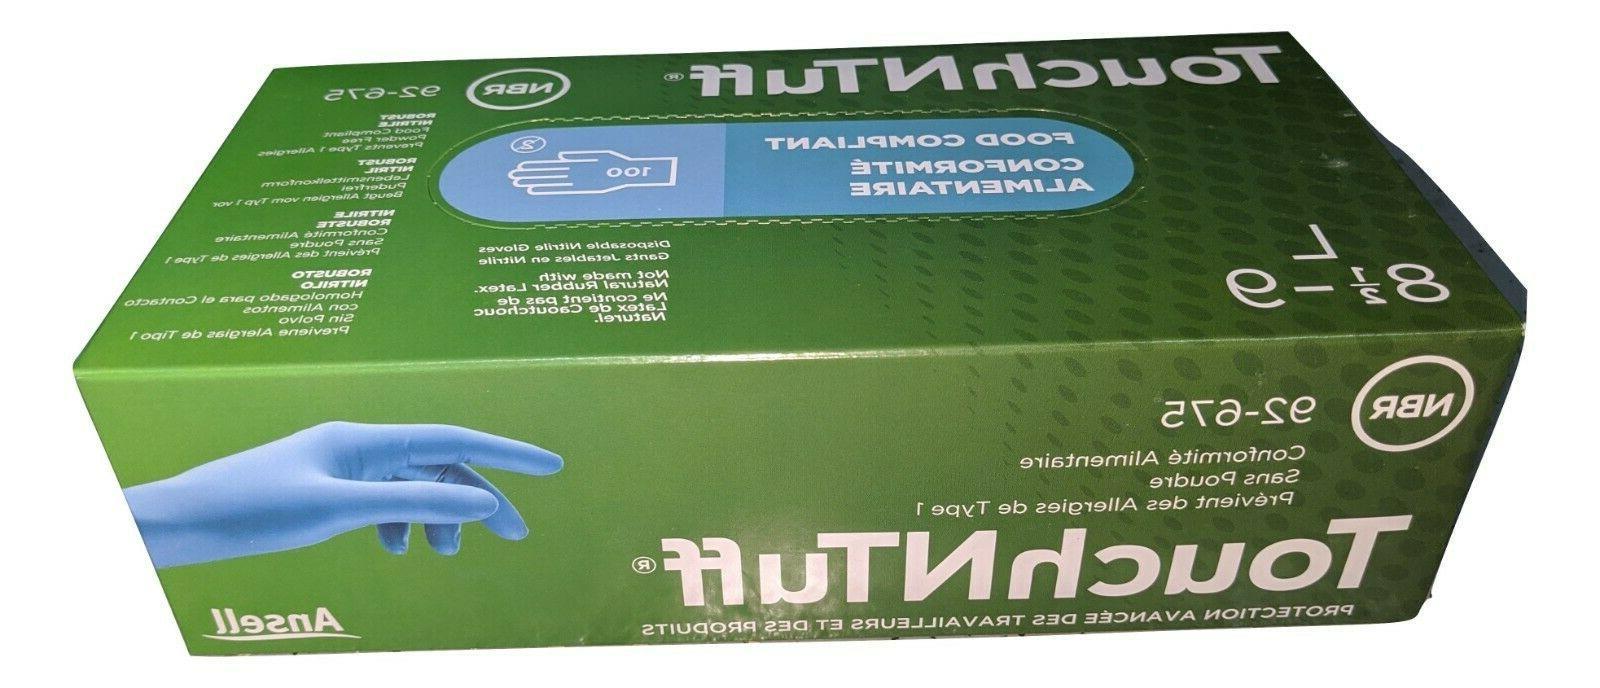 92 675 l touchntuff nitrile disposable gloves